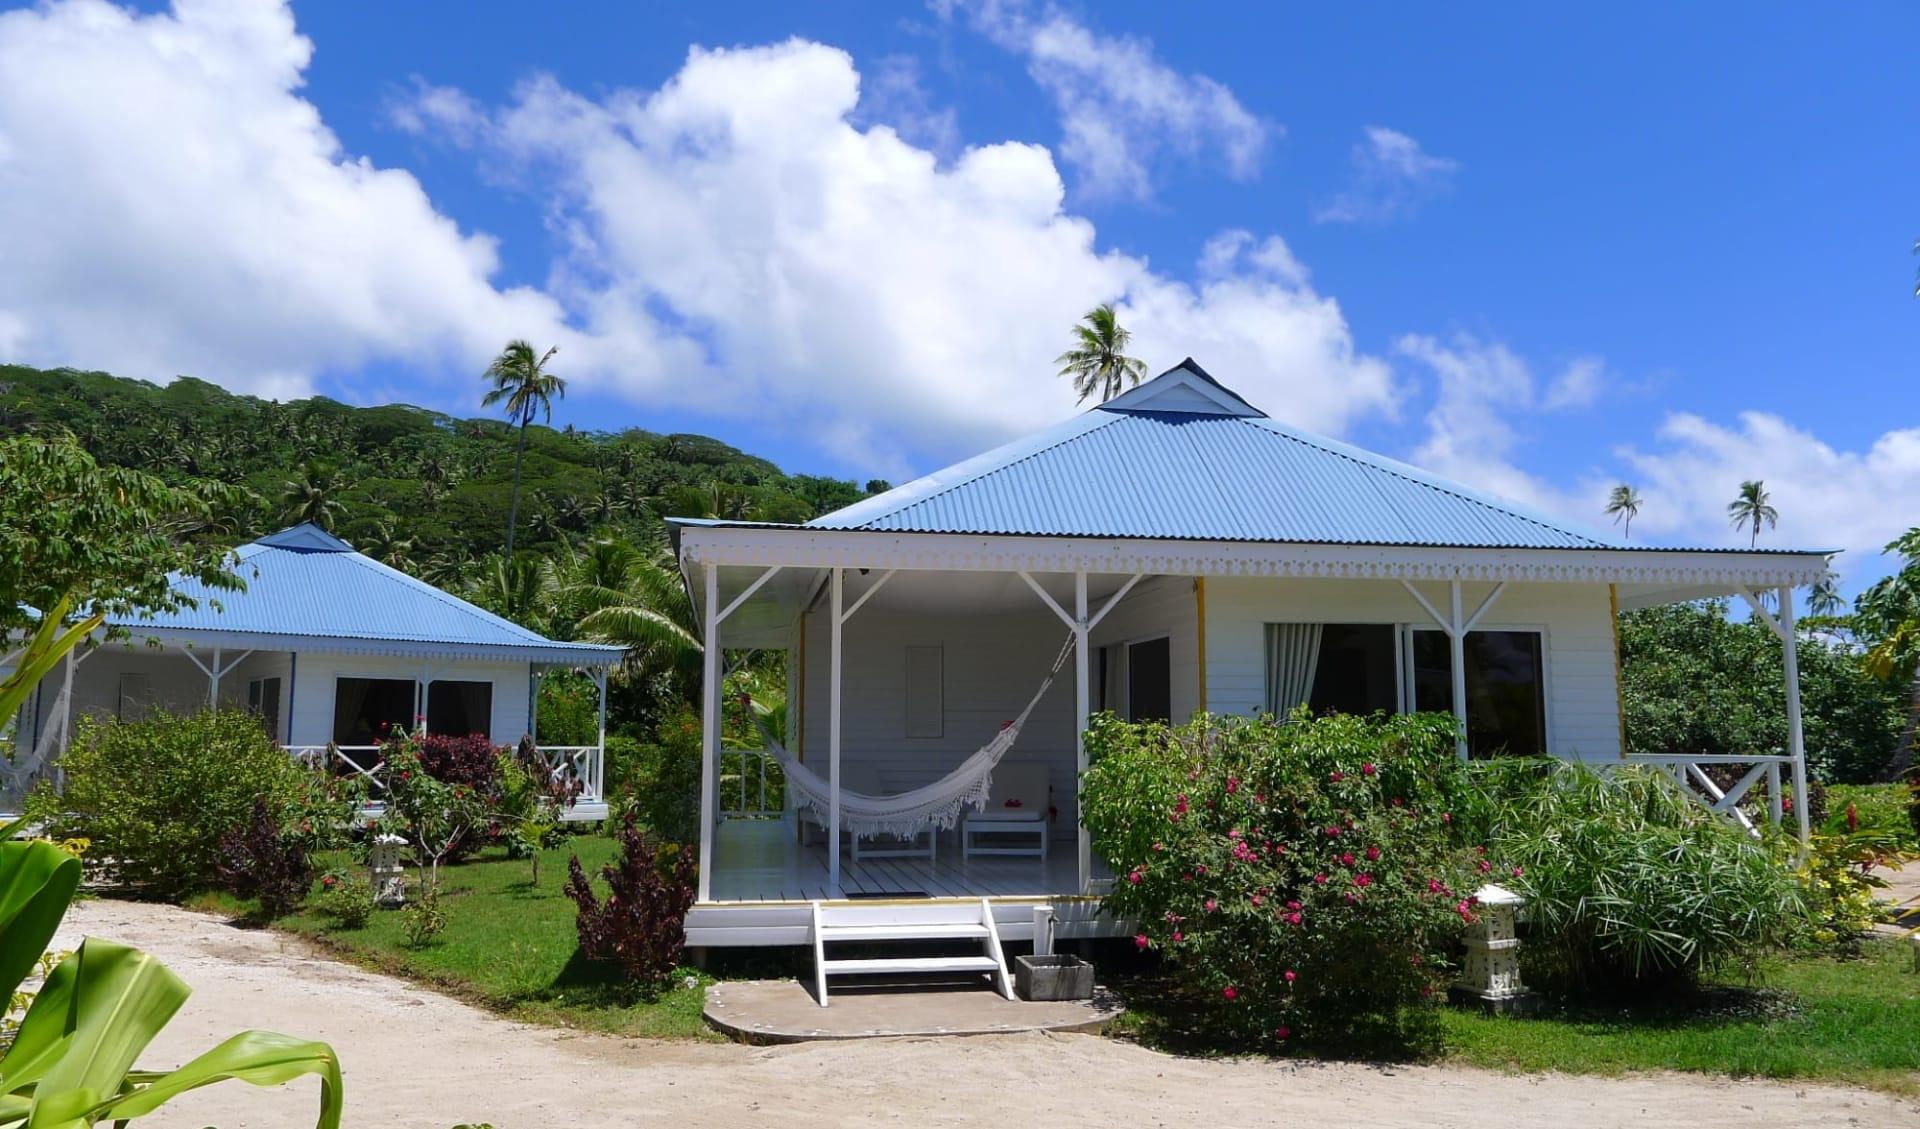 Hôtel Opoa Beach in Raiatea:  RFP Htl Opoa Beach Bungalows 44